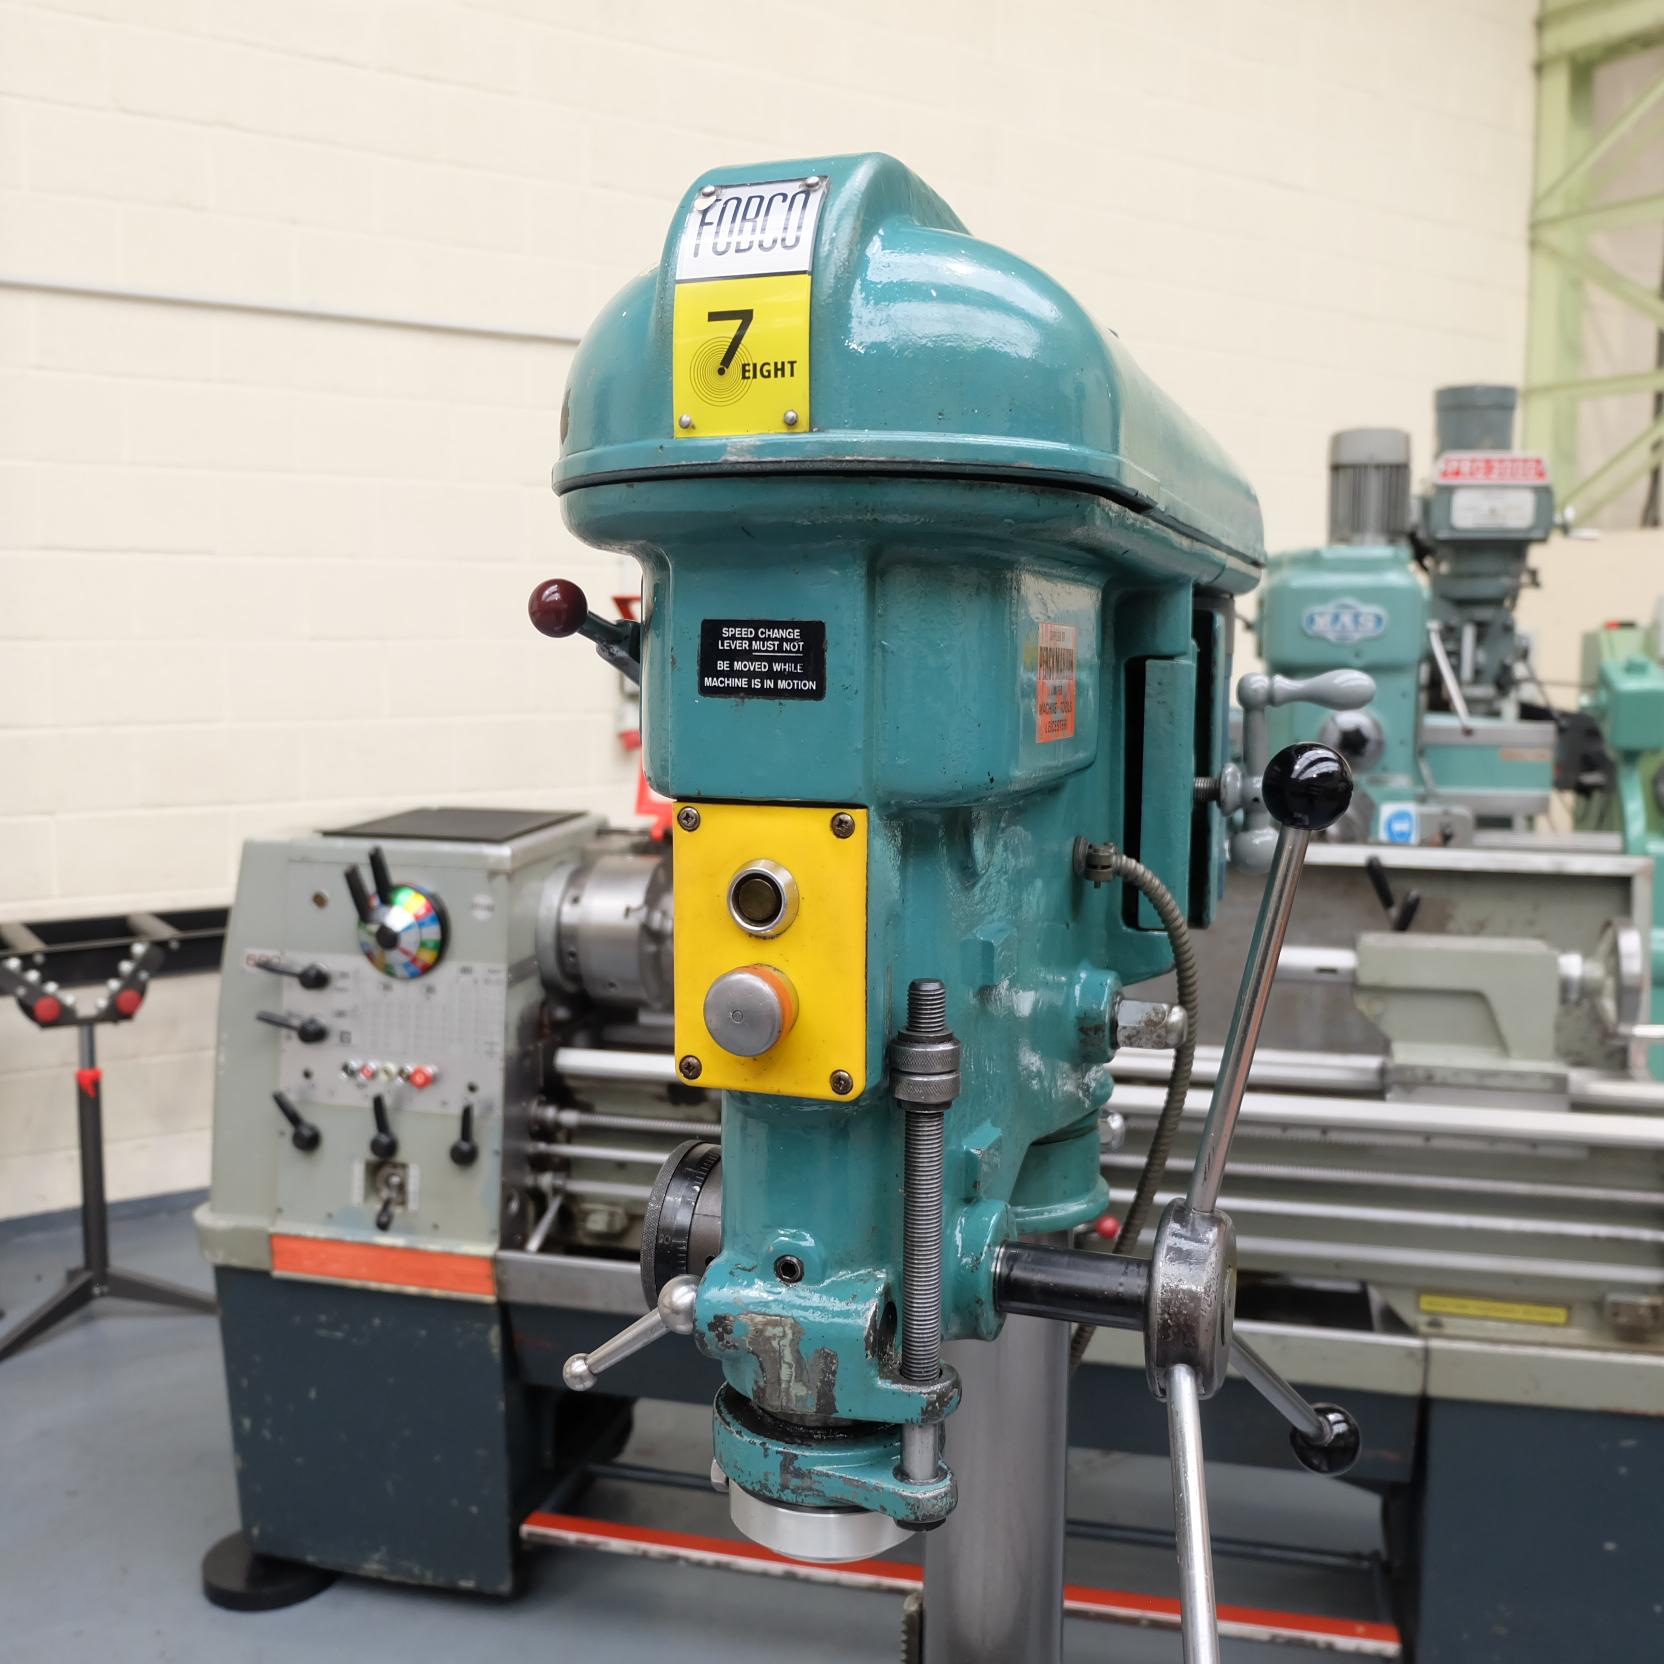 "Fobco 7 Eight: Pillar Drill. No.2 MT. Capacity 7/8"". Speeds 51-2650rpm. - Image 2 of 7"